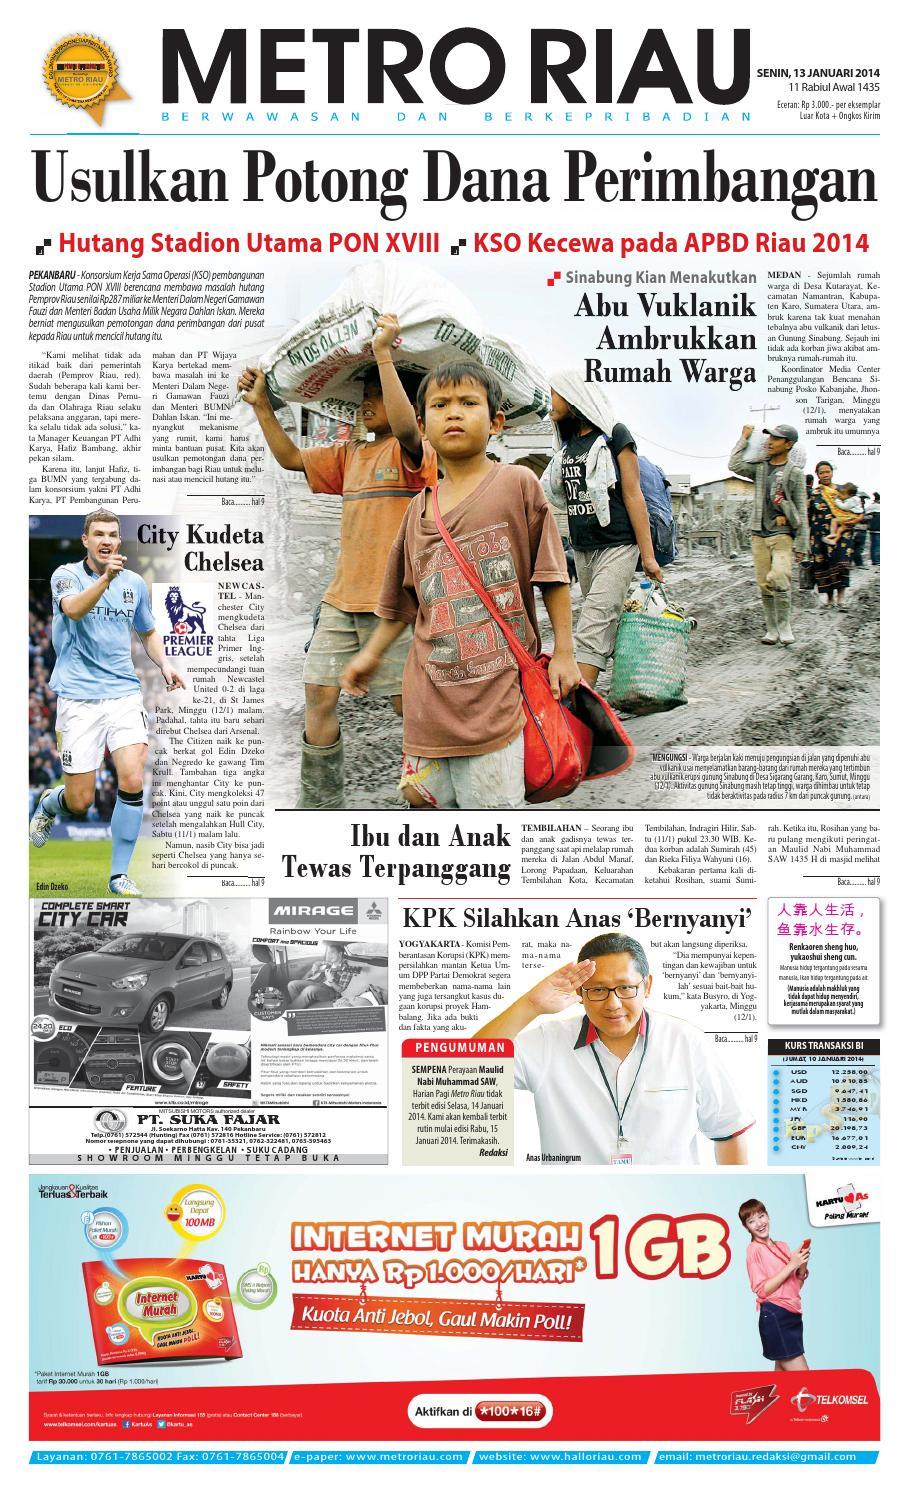 130114 By Harian Pagi Metro Riau Issuu Produk Ukm Bumn Rasa Dewa Sari Buah Mbing 250ml Jus Free Ongkir Depok Ampamp Jakarta